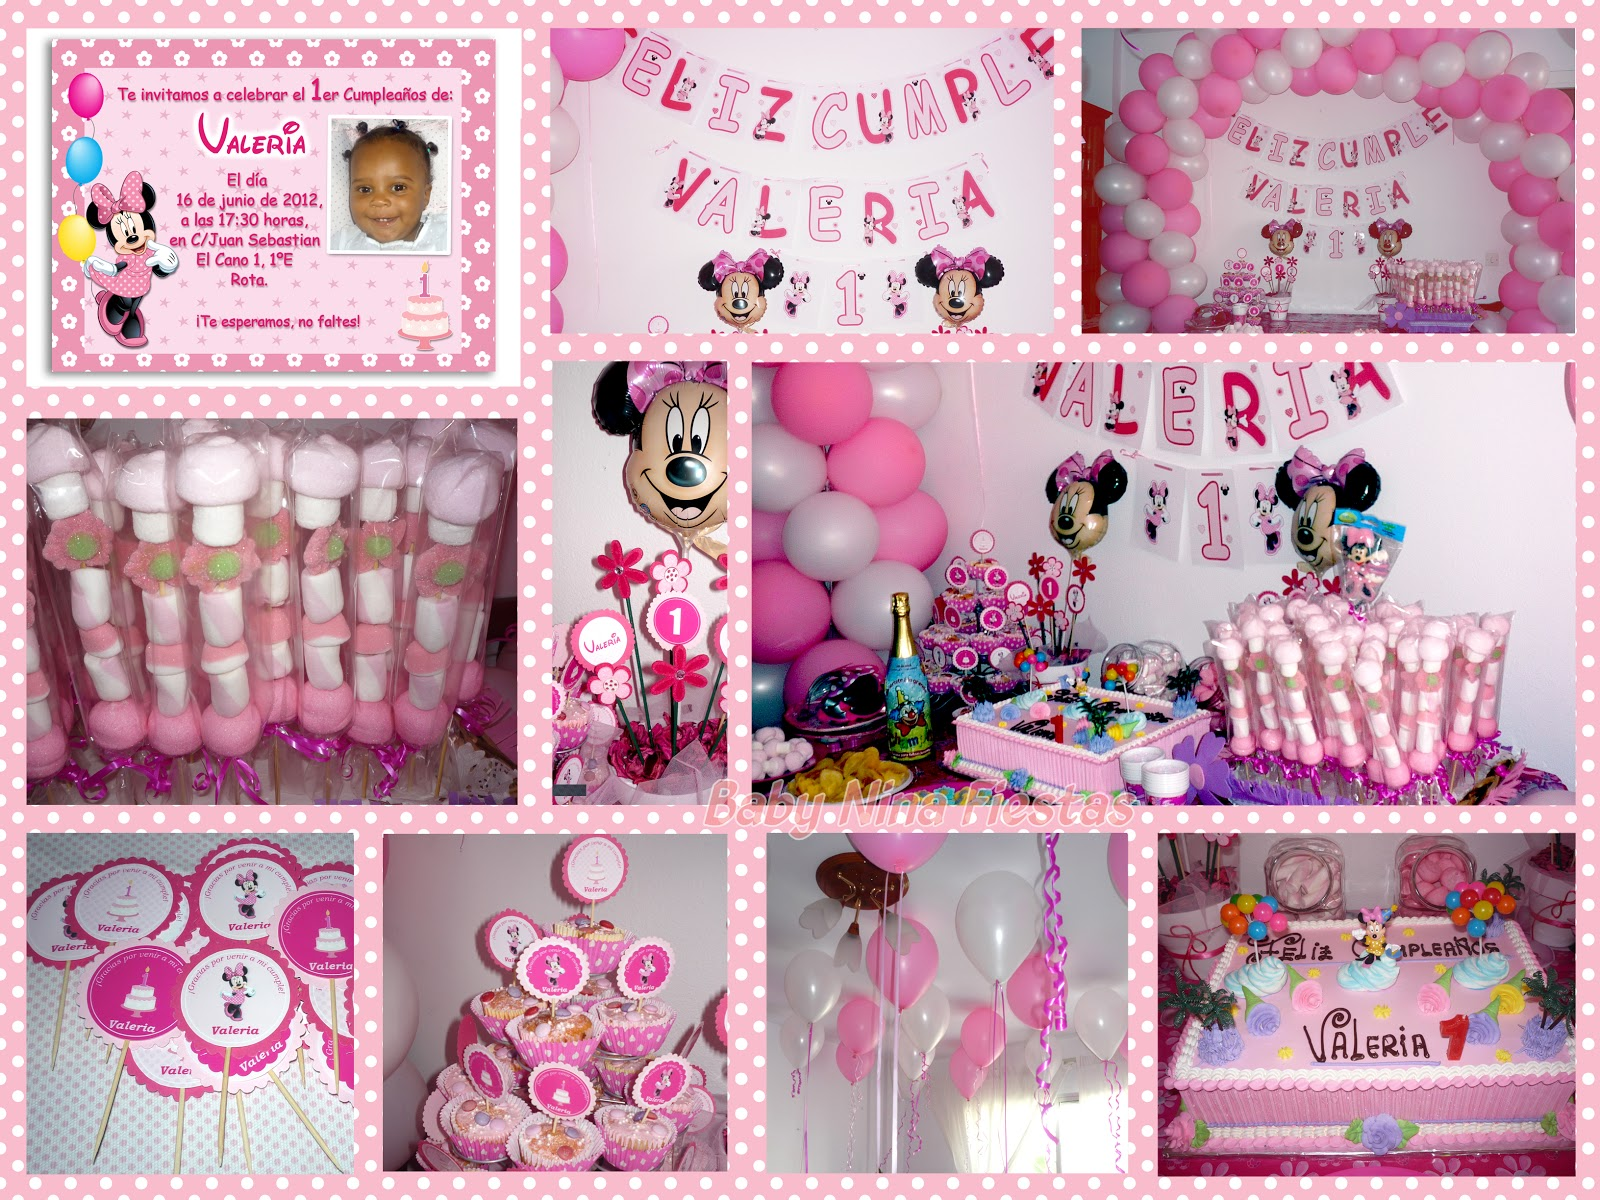 Baby Nina Fiestas: Fiesta temática Minnie Mouse para Valeria